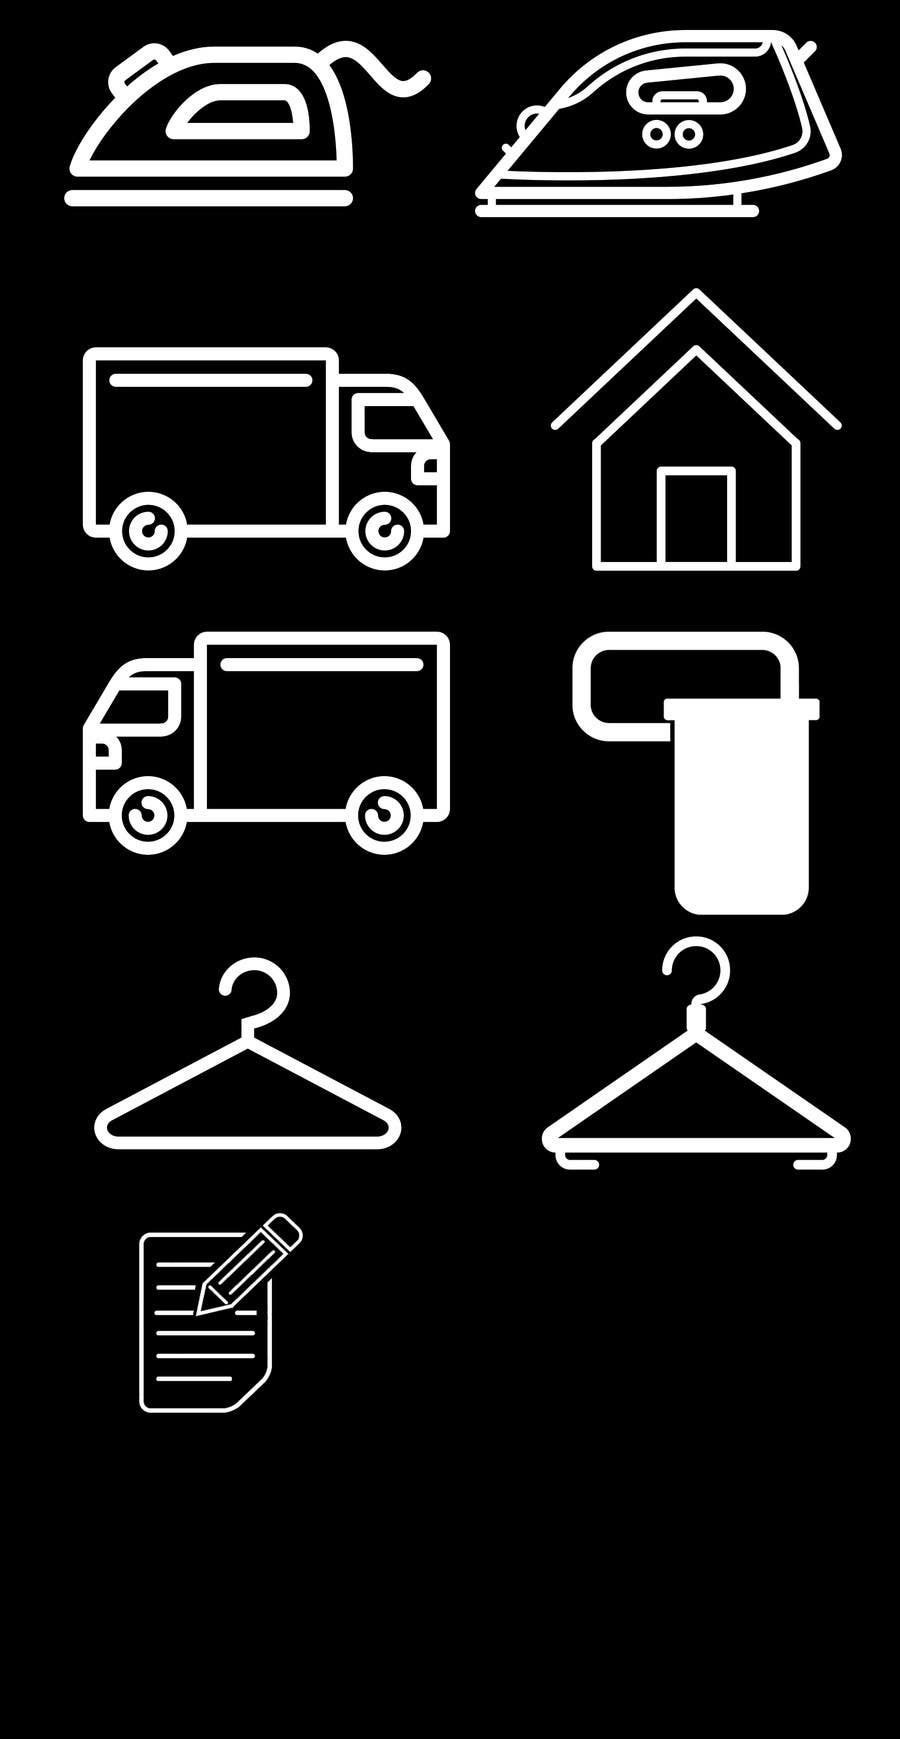 Proposition n°4 du concours Design some Icons